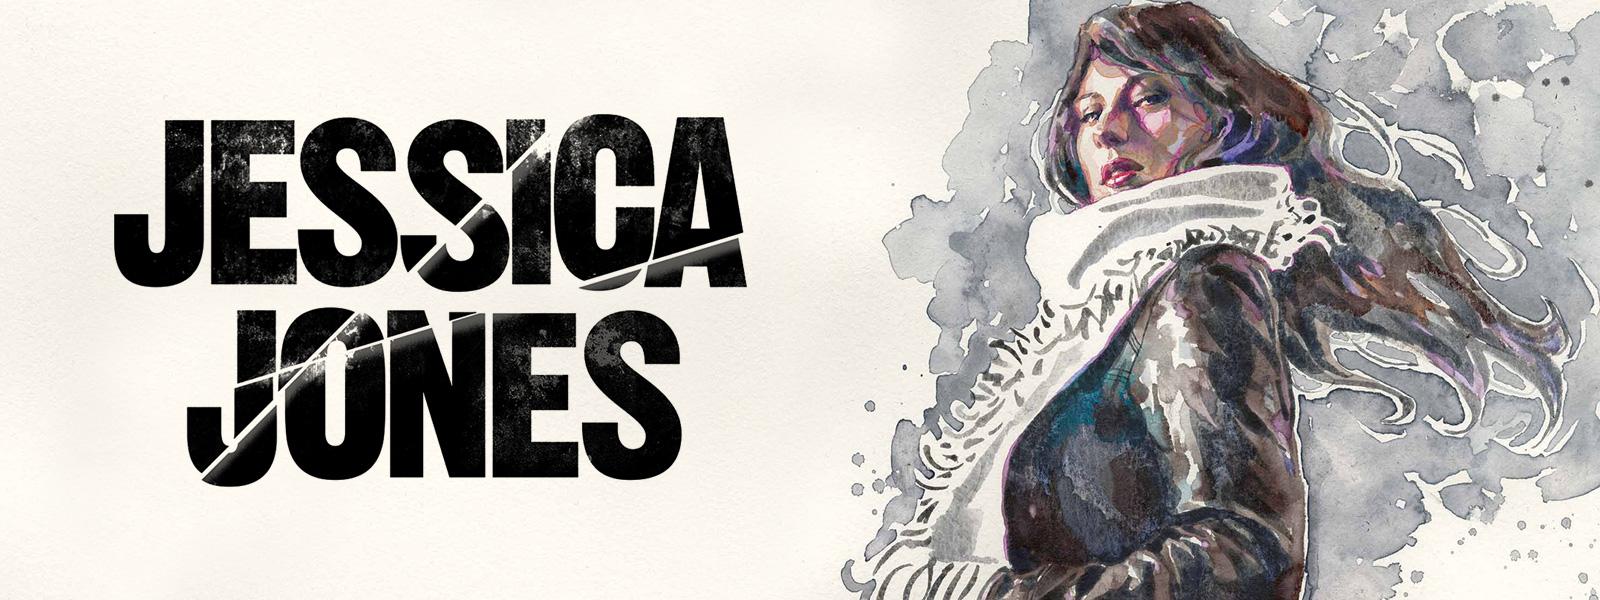 Jessica Jones - Comic Subscription